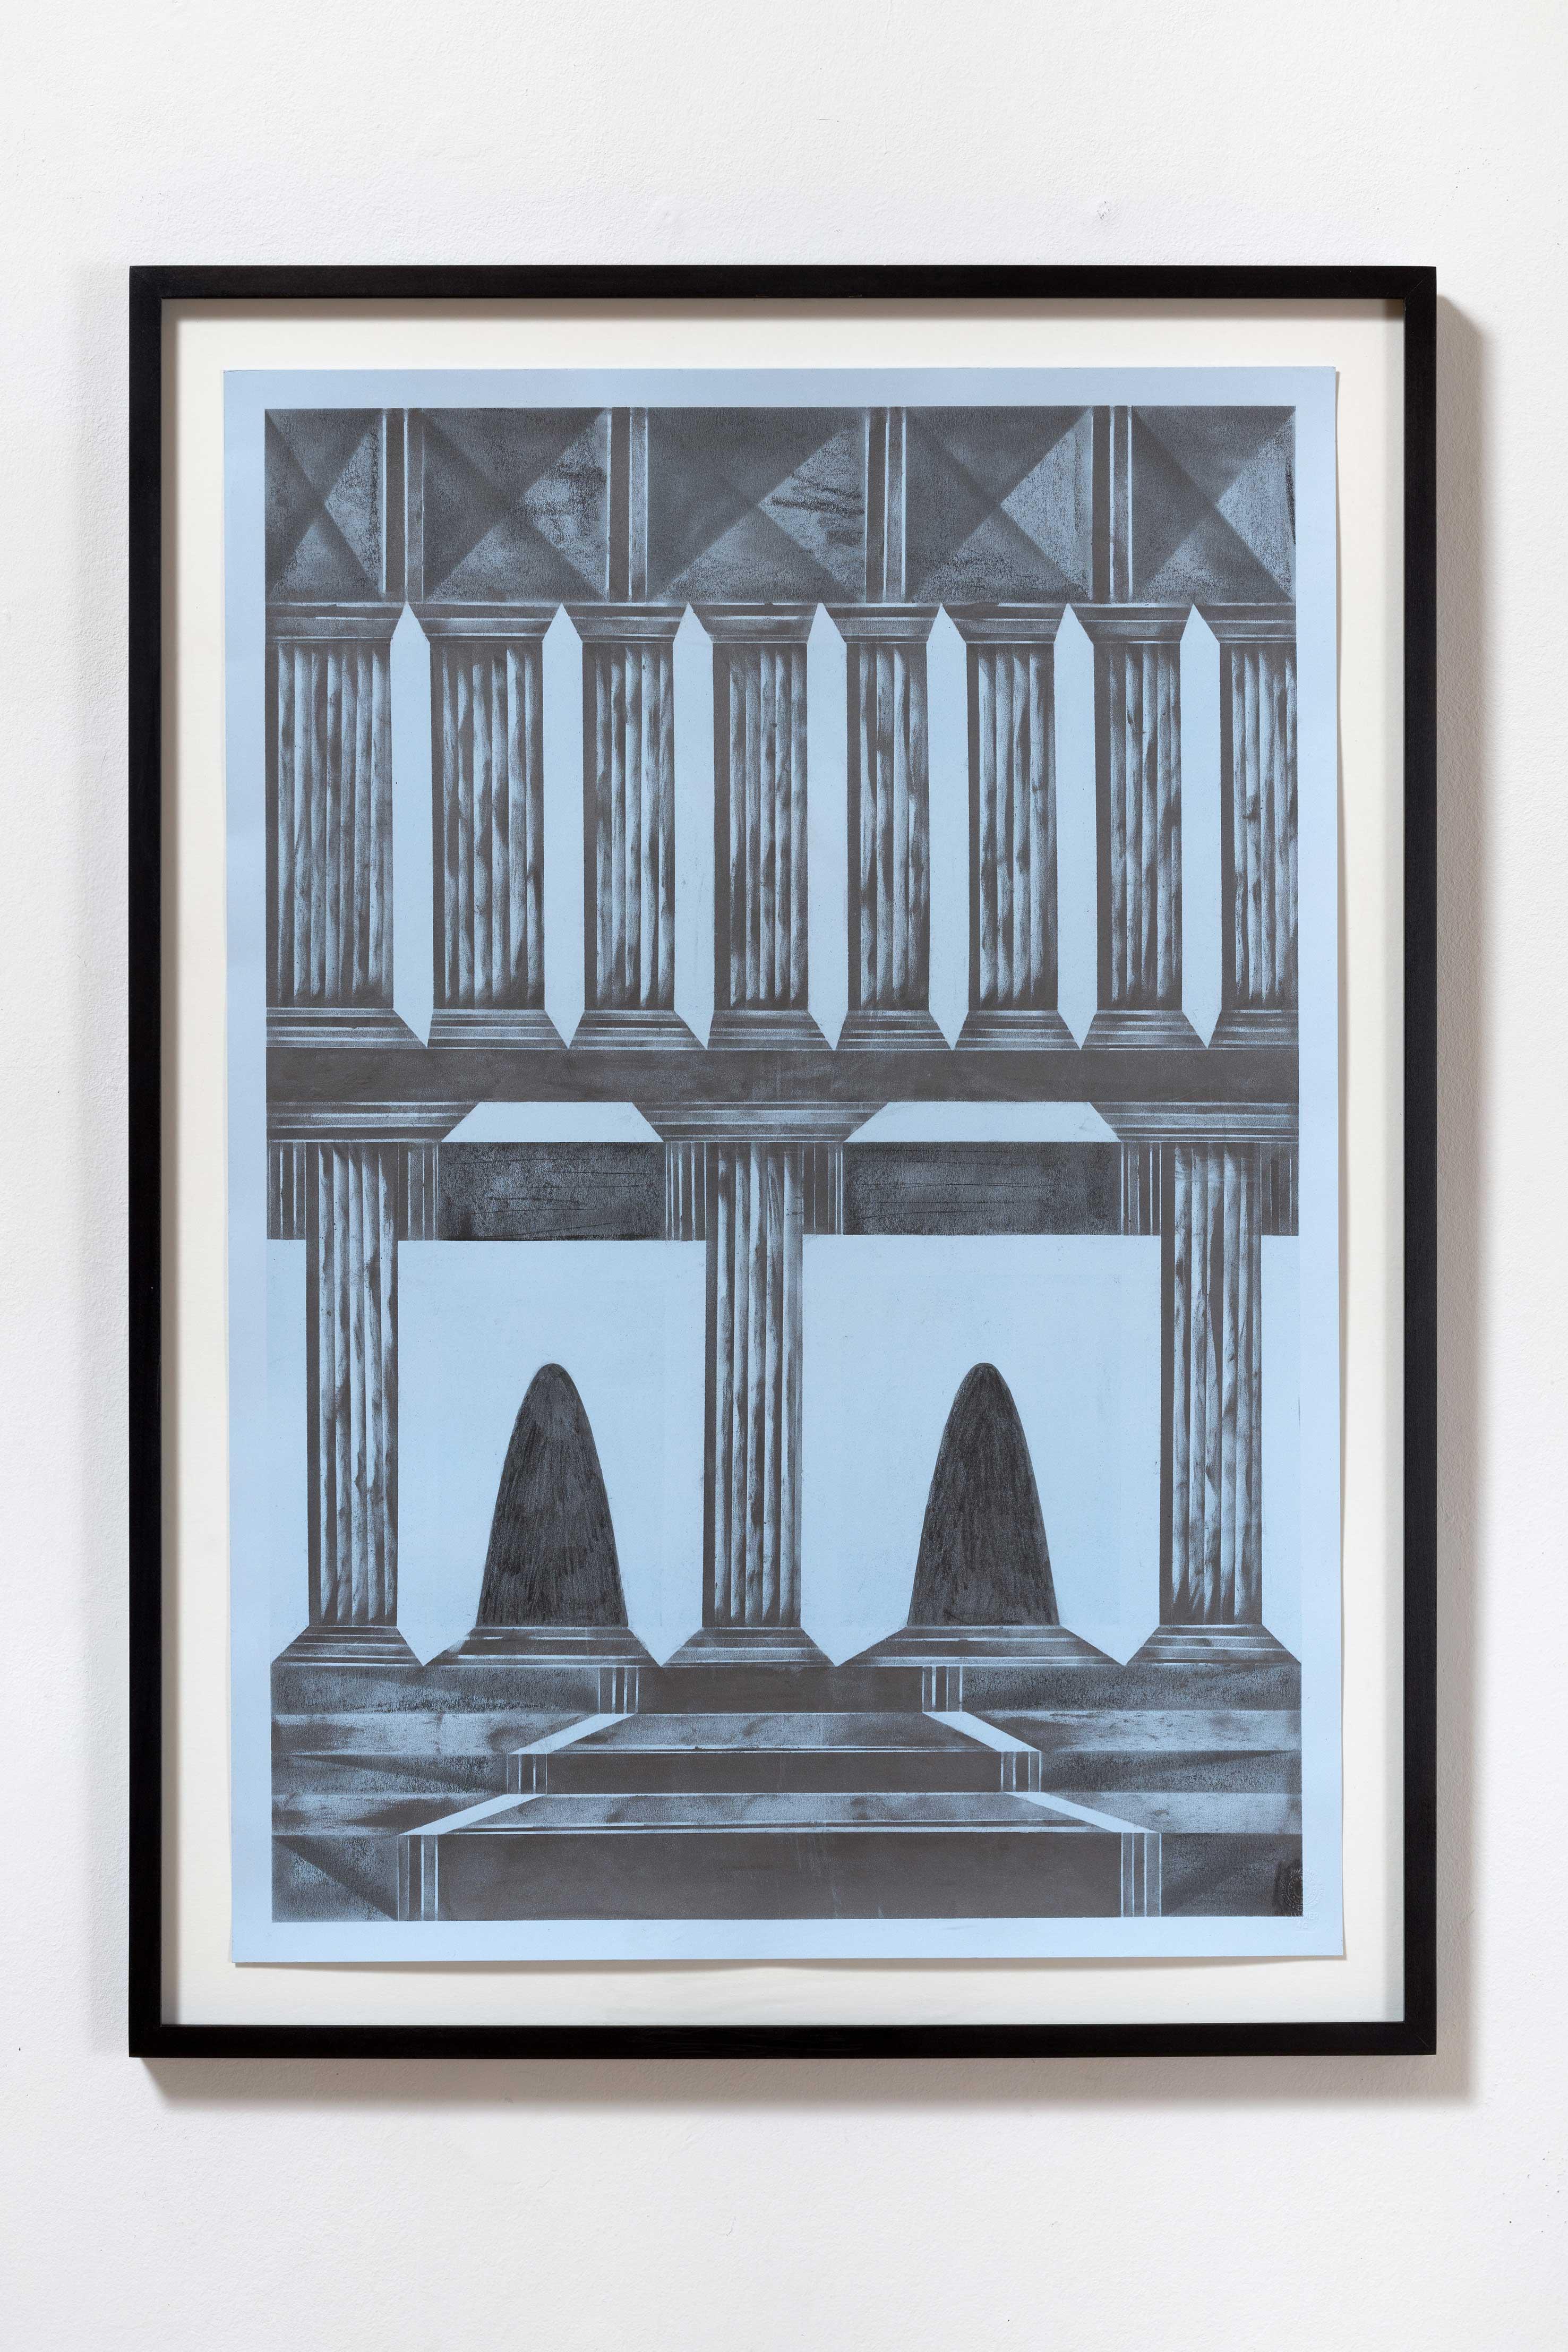 """all I believe that happened there was vision I"", Bleistift auf Papier, 73 x 51 cm (Foto: VILTIN Gallery / Dávid Biró)"